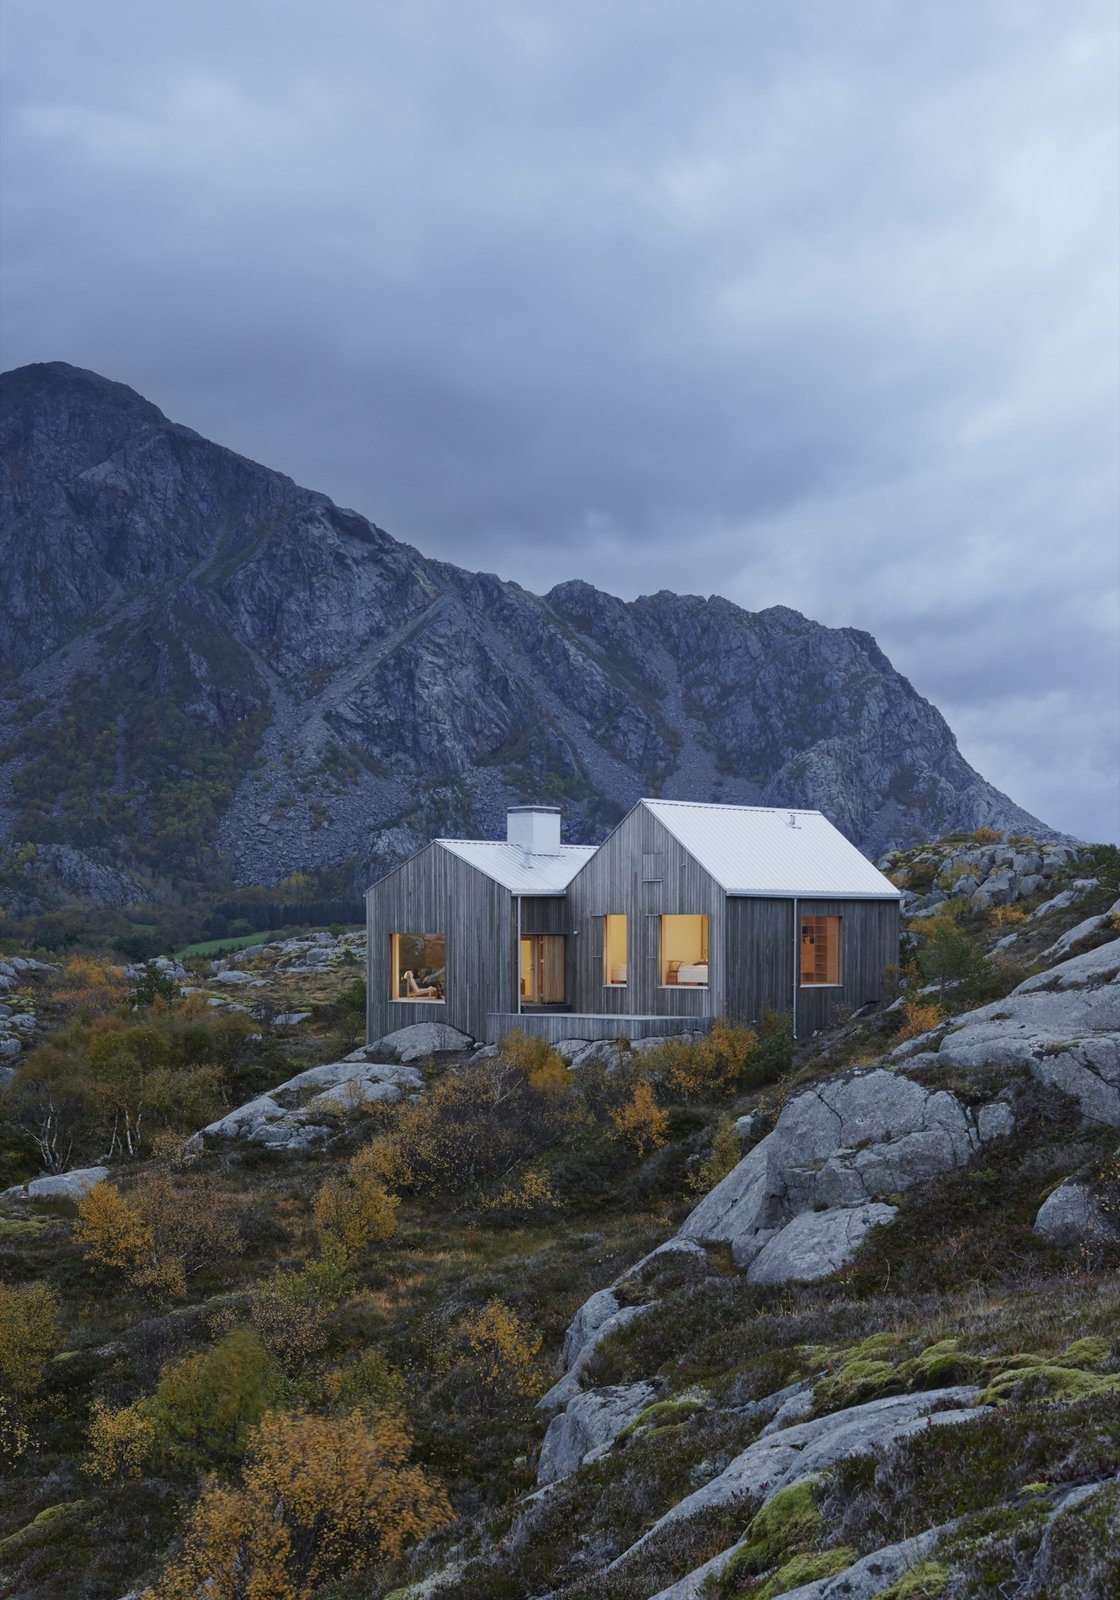 Naked Naust | Vega Island, Norway  A dramatic cabin by Swedish architect Erik Kolman Janouch on Norway's wild Vega Island.  Cabin Love by Sandra Henderson